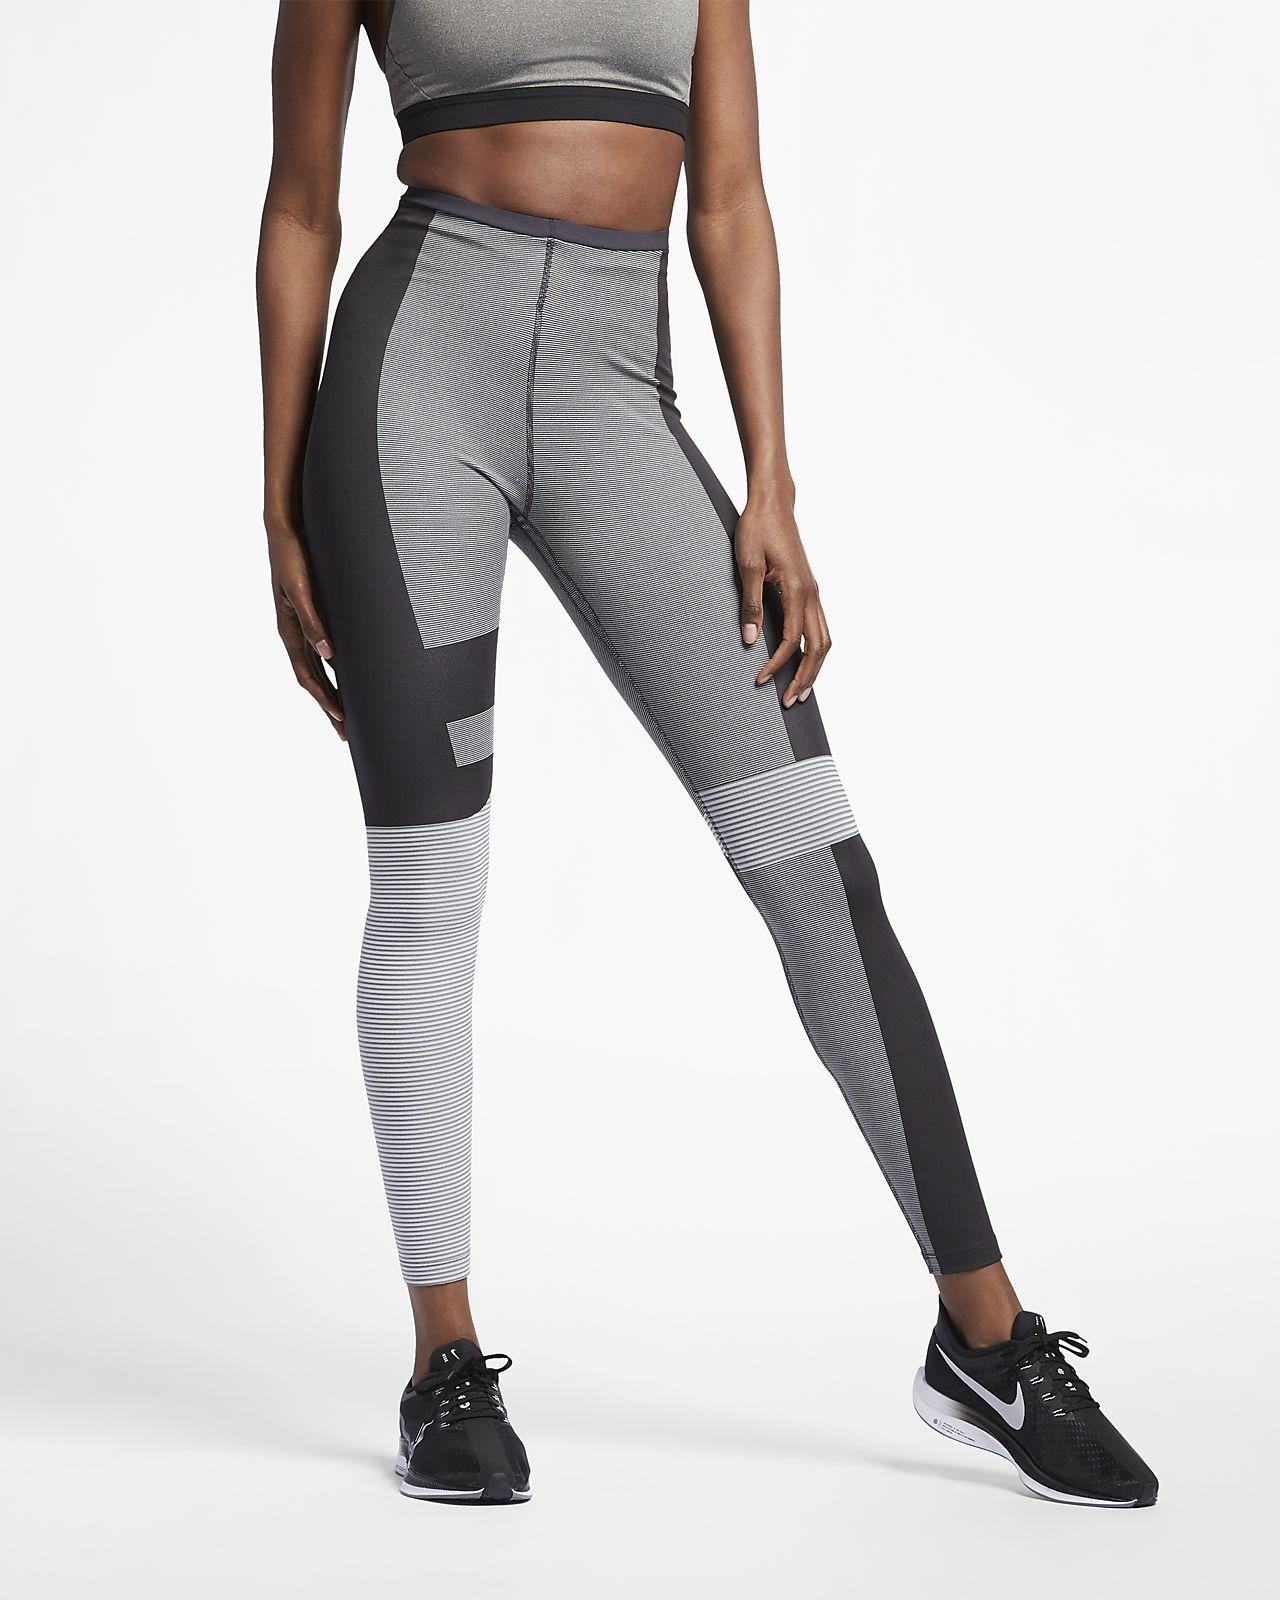 8e9f8158bc5c1 Nike Tech Women's Running Tights. Nike.com AU